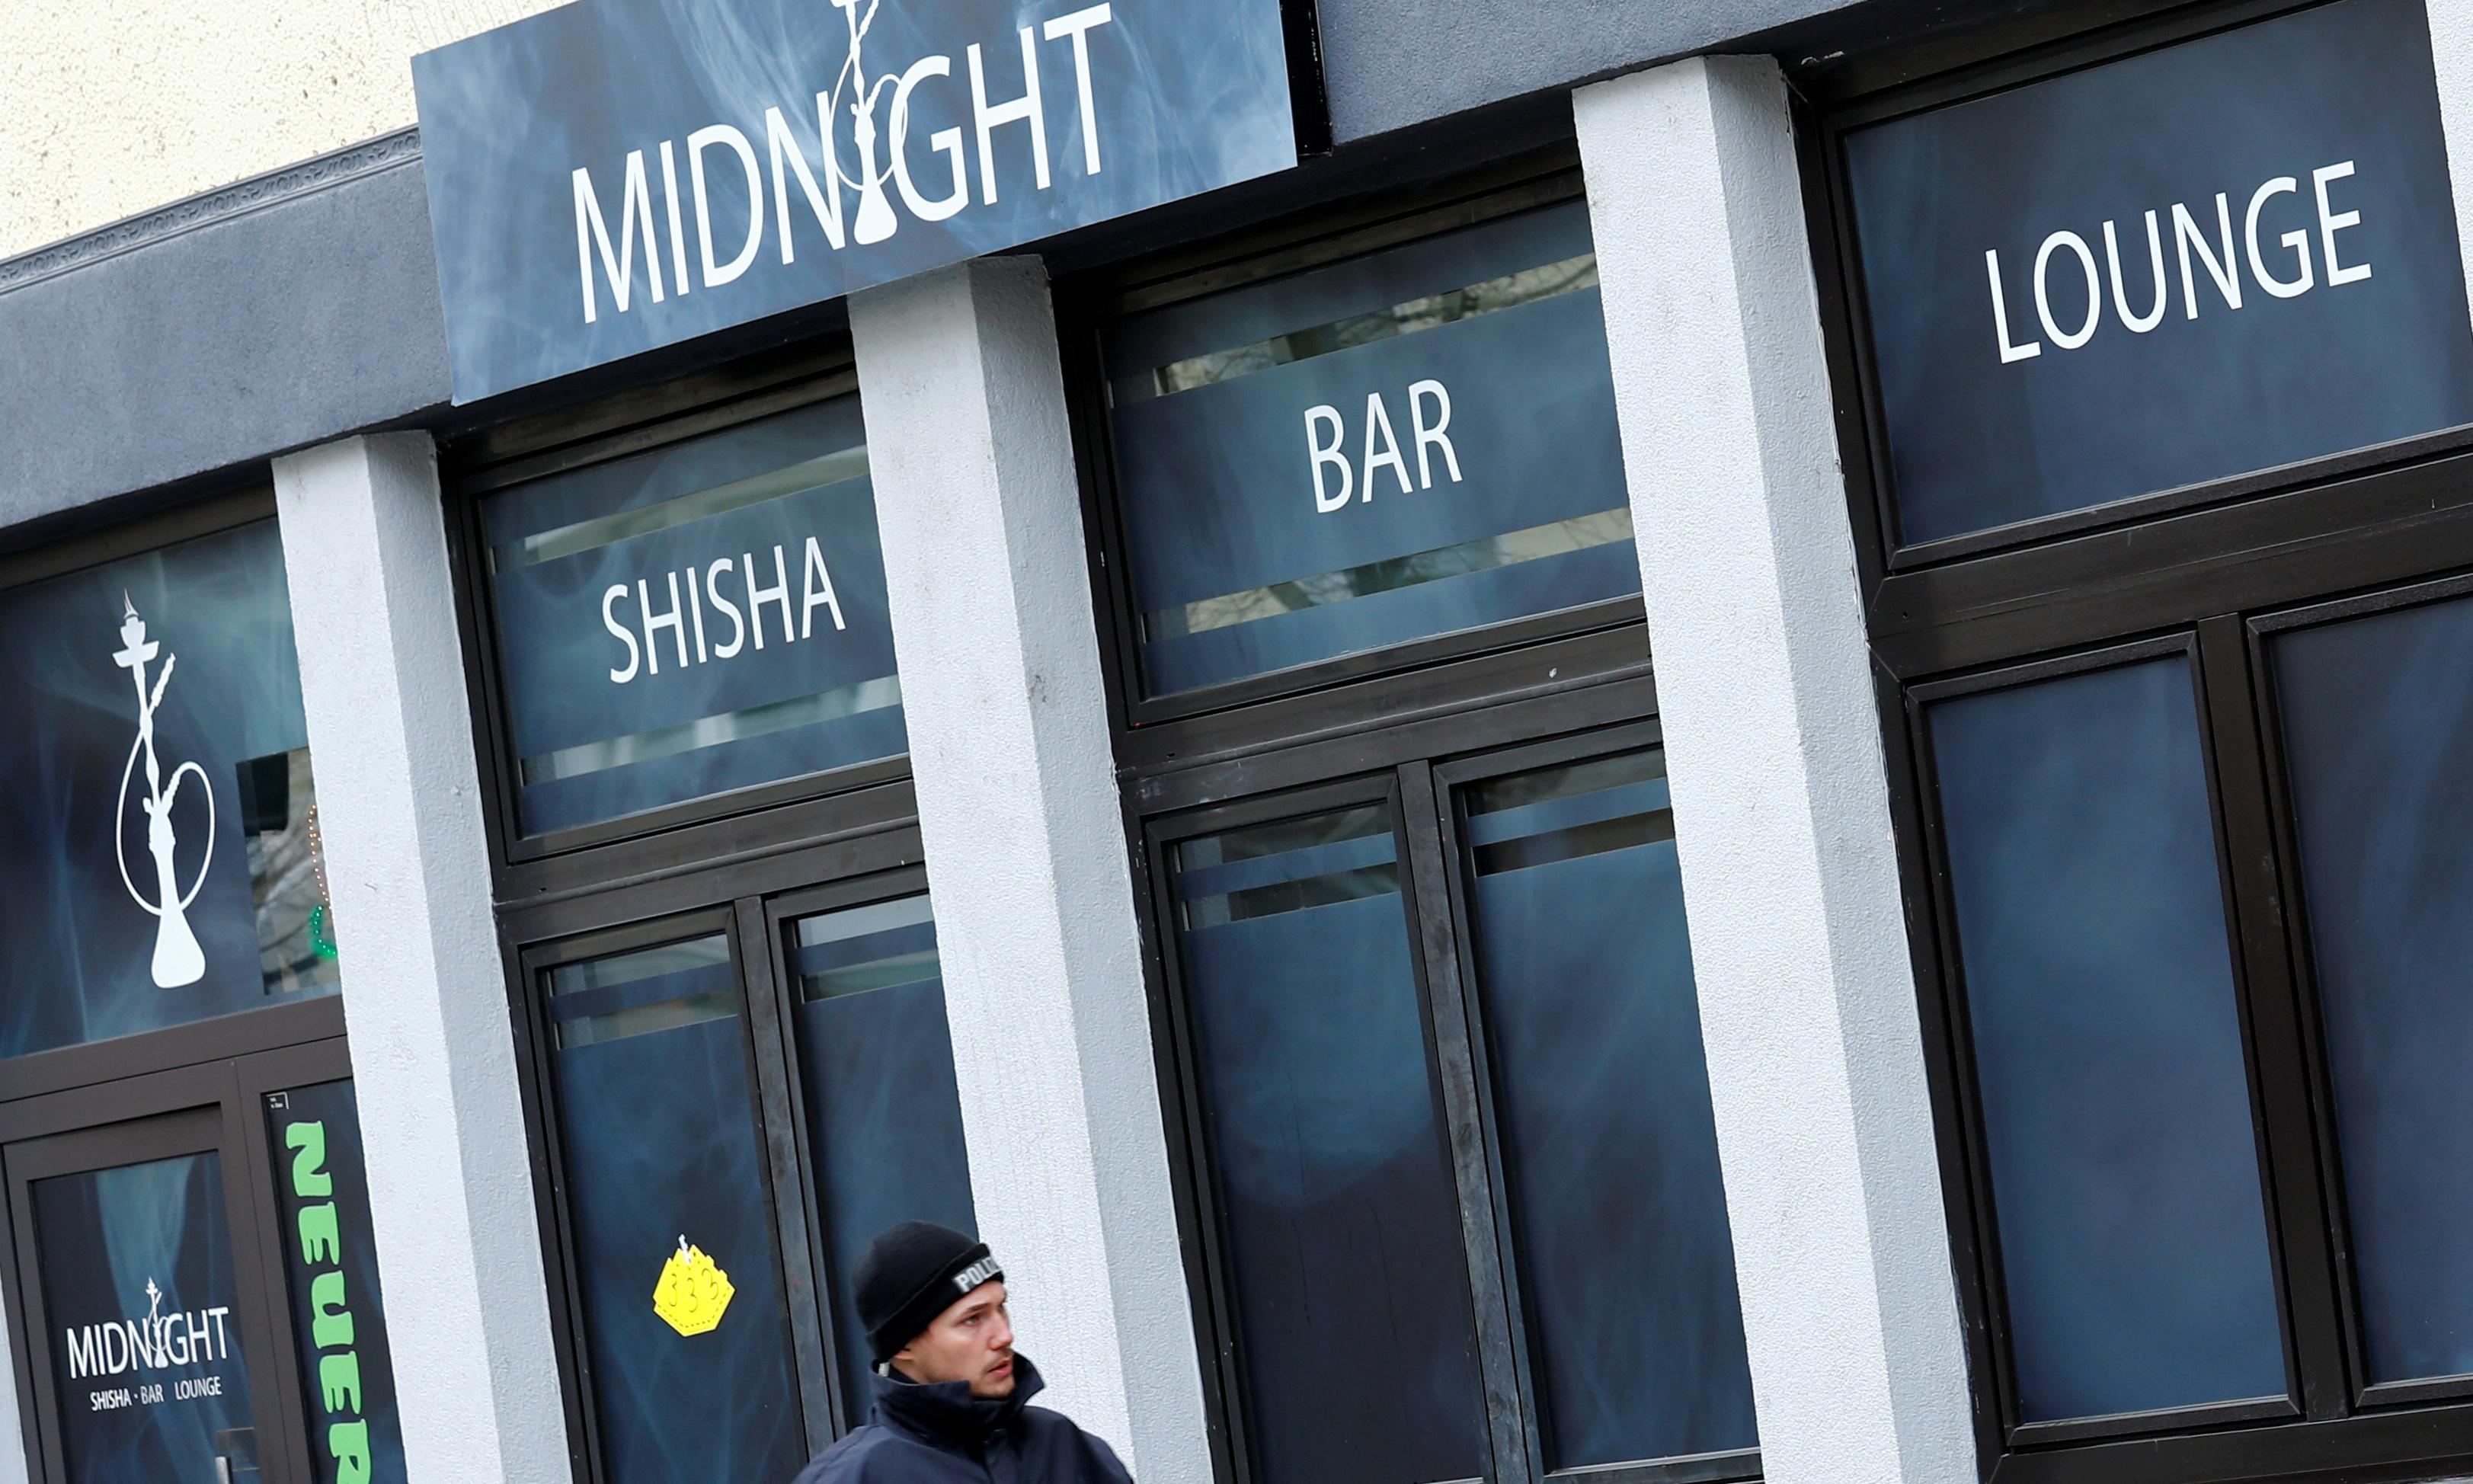 Bar staff and pregnant woman reportedly among Hanau victims